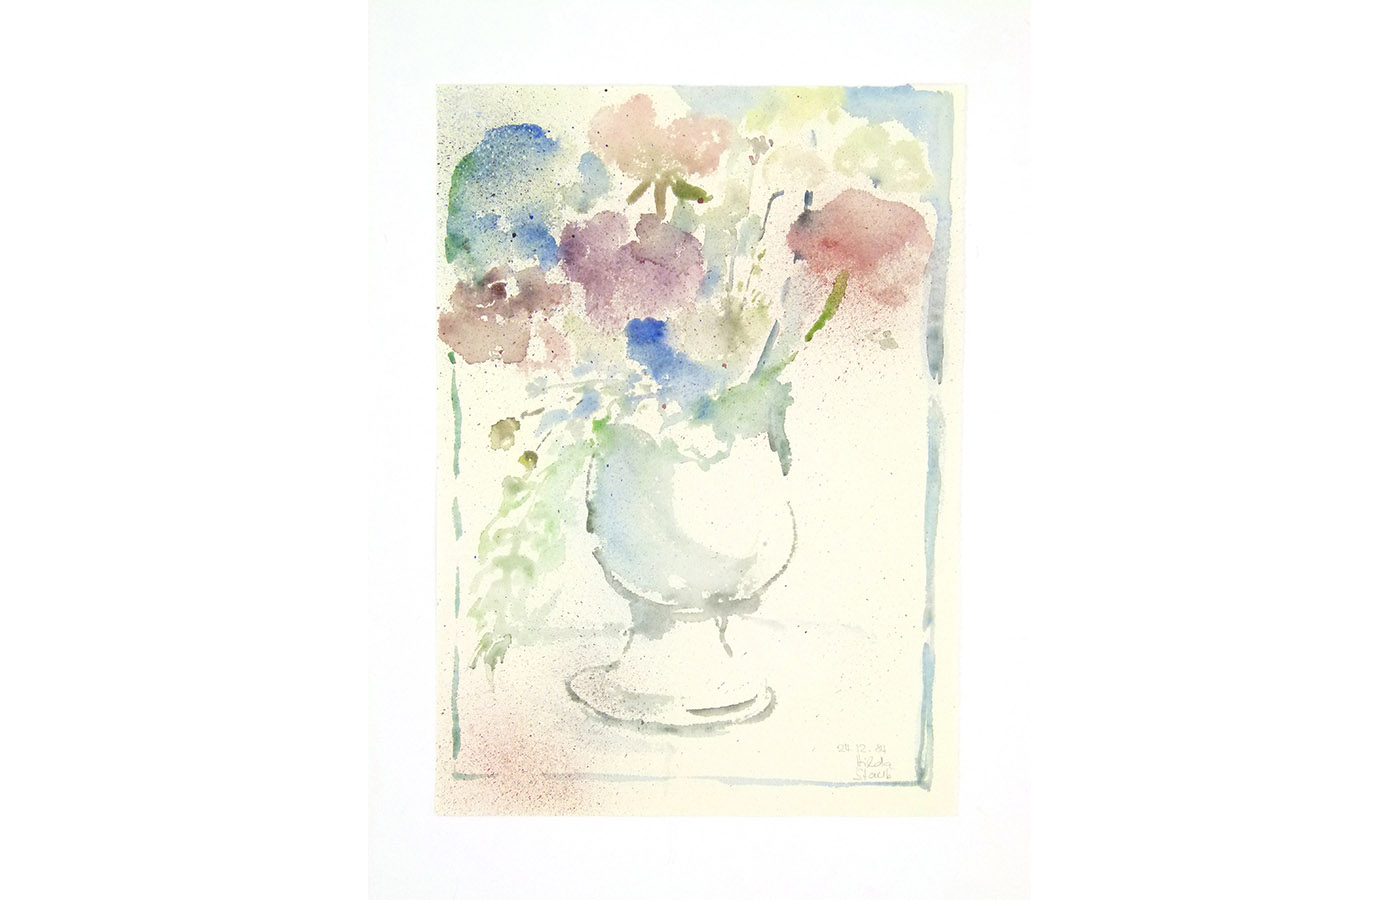 Blumen_0053_L1100371a